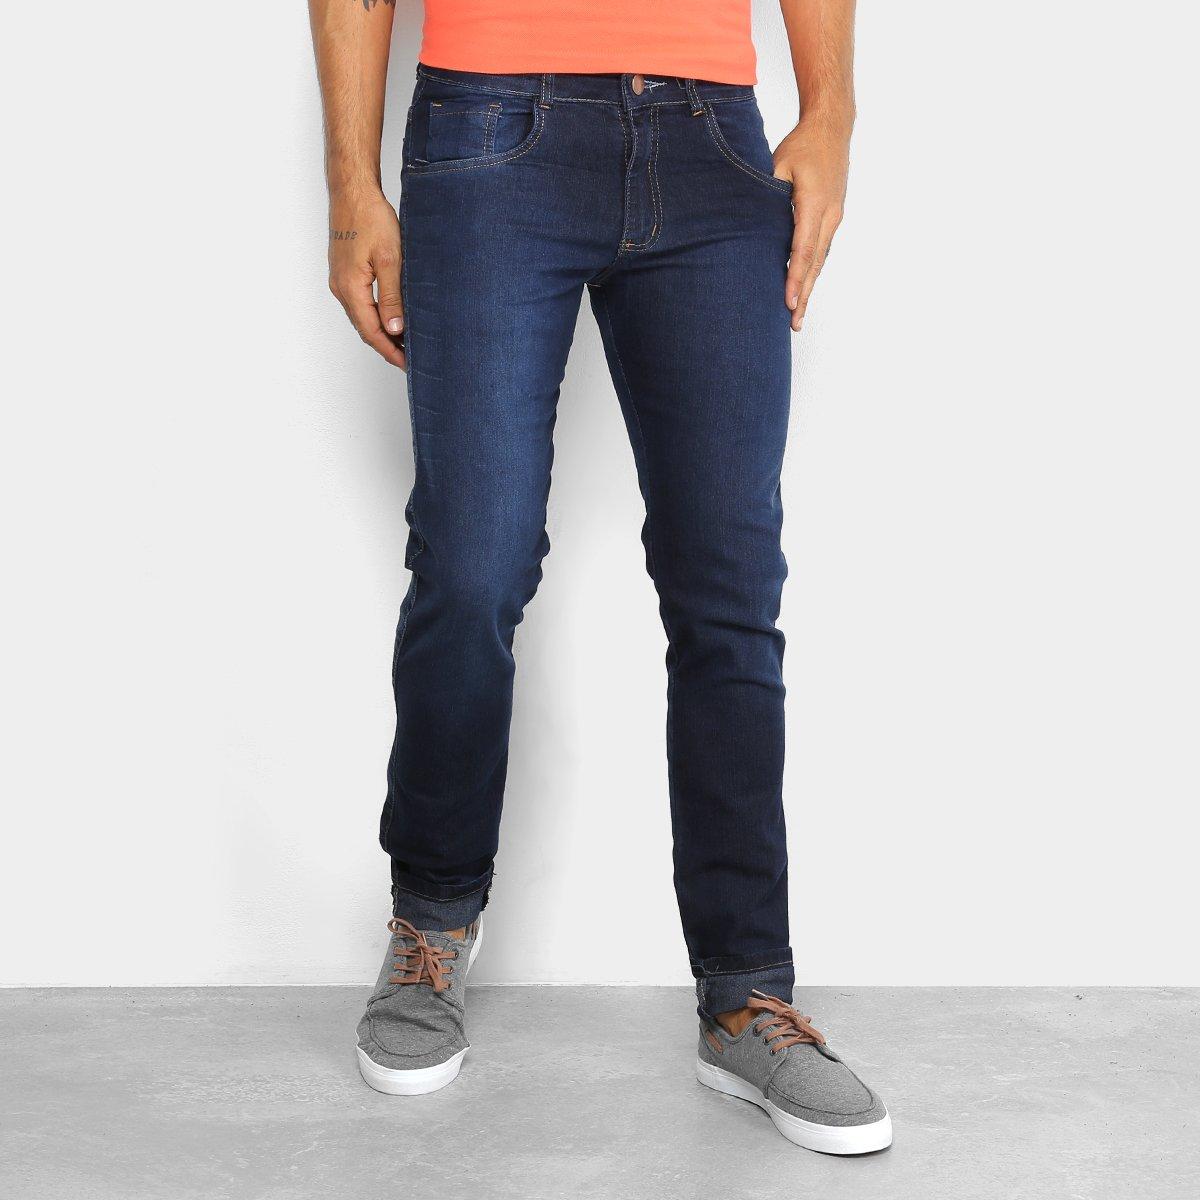 d7e0272d6 Calça Jeans Skinny Coffee Marmorizada Masculina